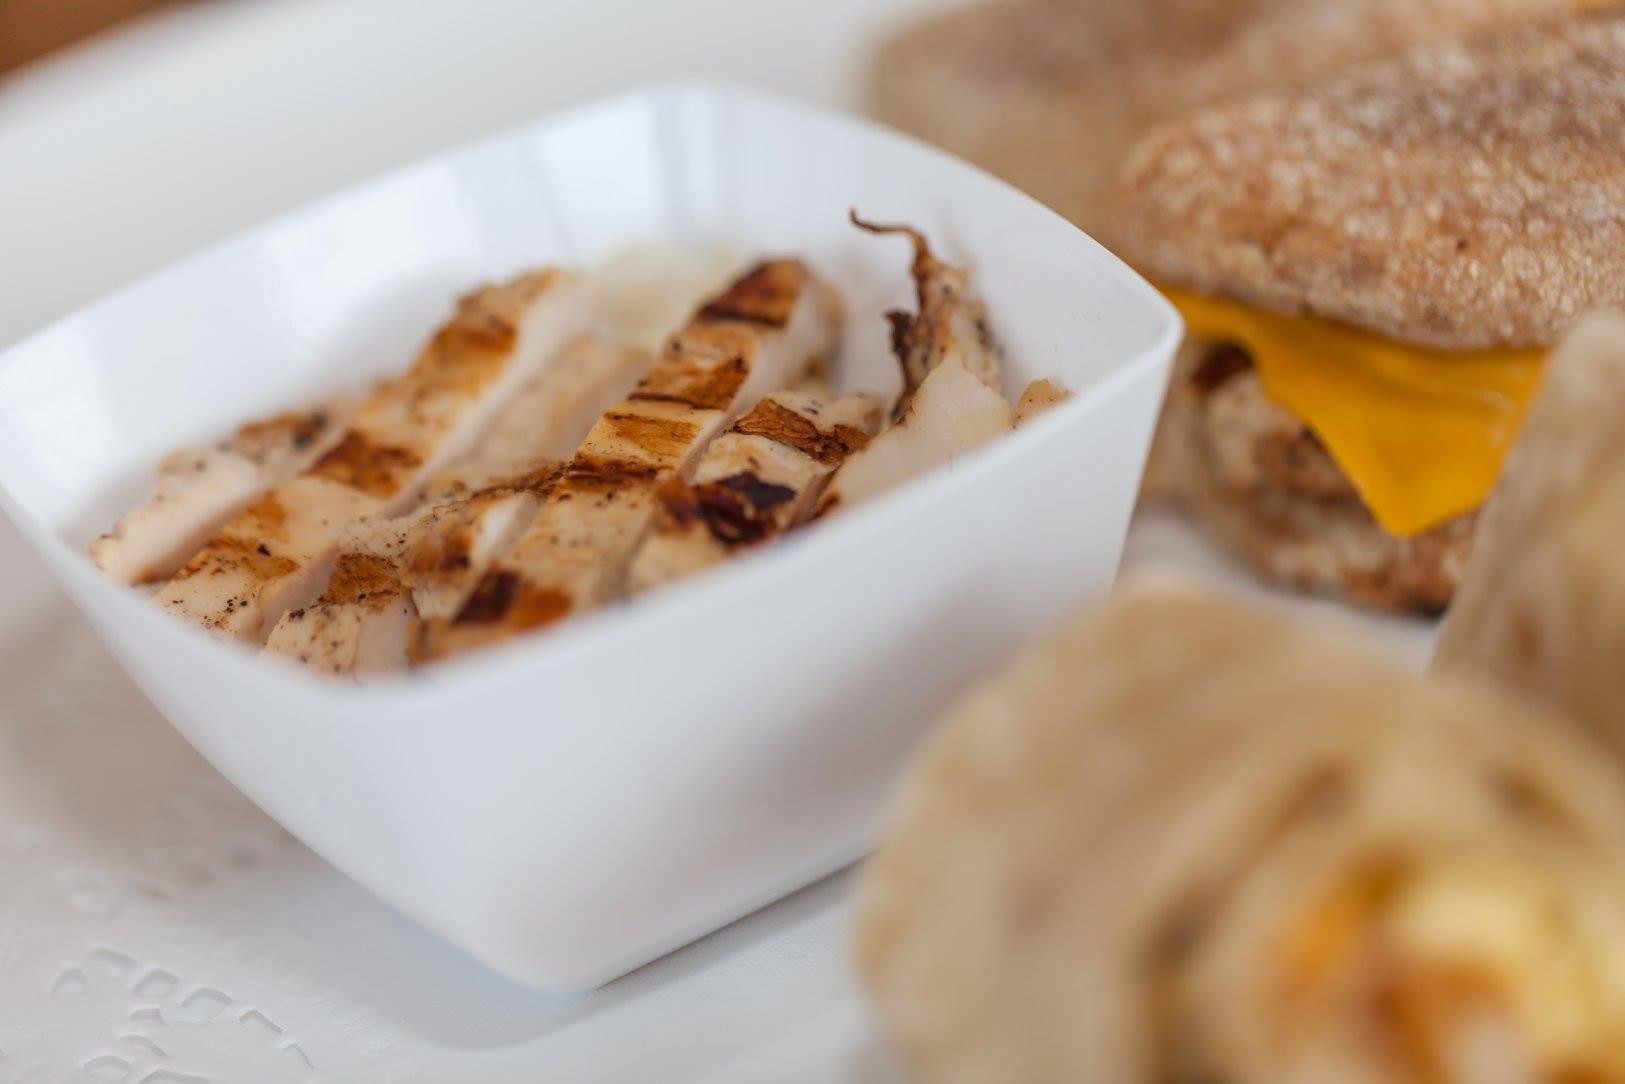 Chick Fil A Healthy Breakfast  Chick fil A Healthier Breakfast Options Beltway Bargain